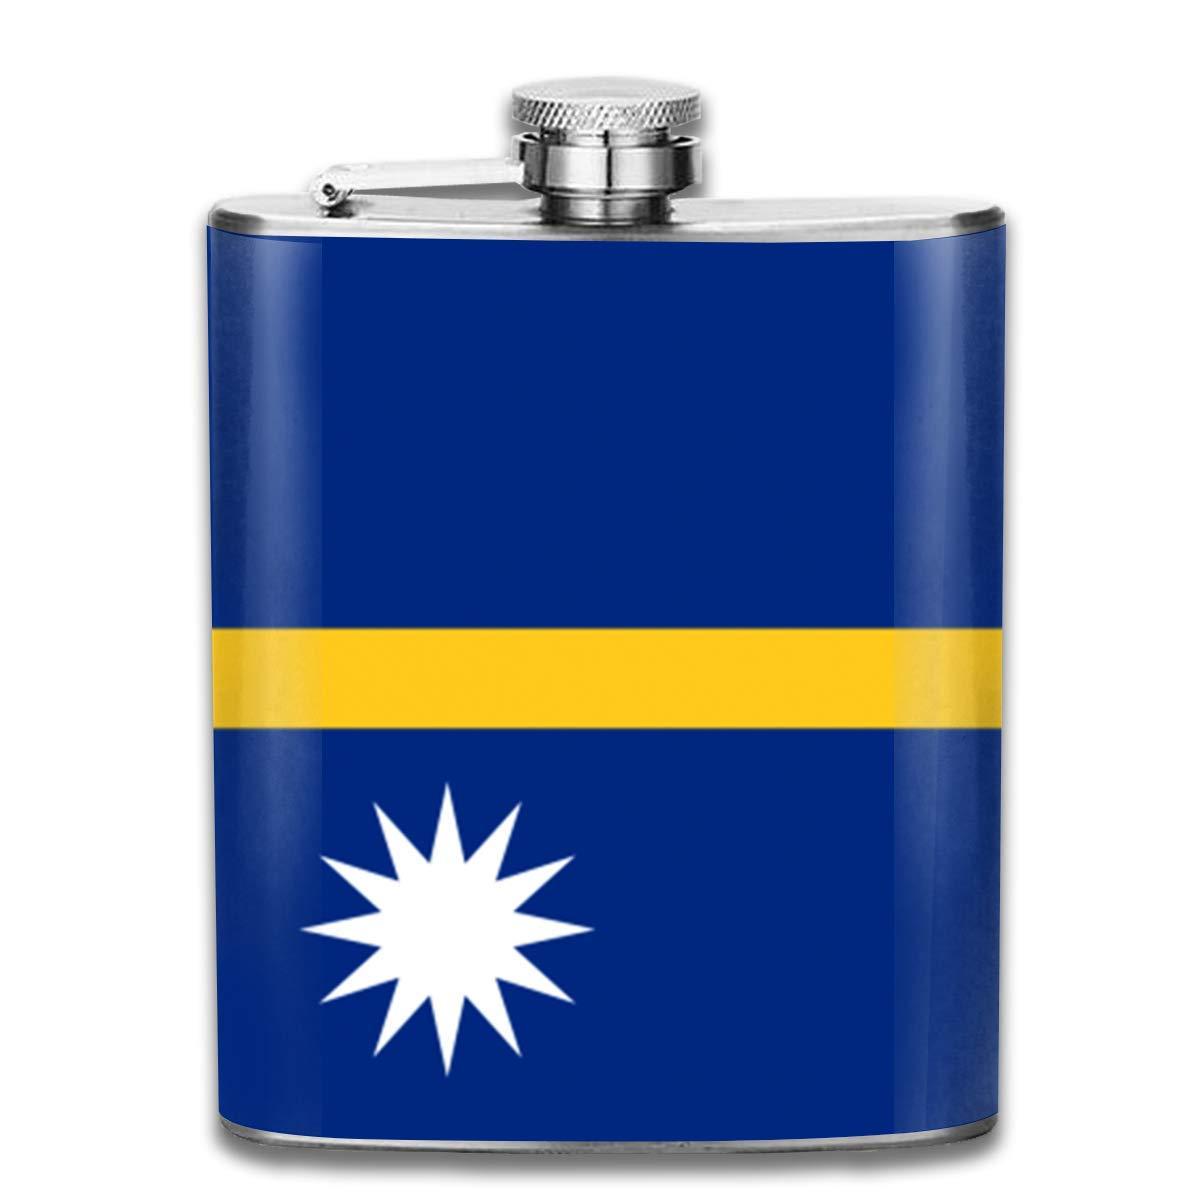 Ejdkdo Nauru Flag Stainless Steel Flask Classic 7OZ Hip Flask Pocket Flagon Whiskey Wine Flagon Mug